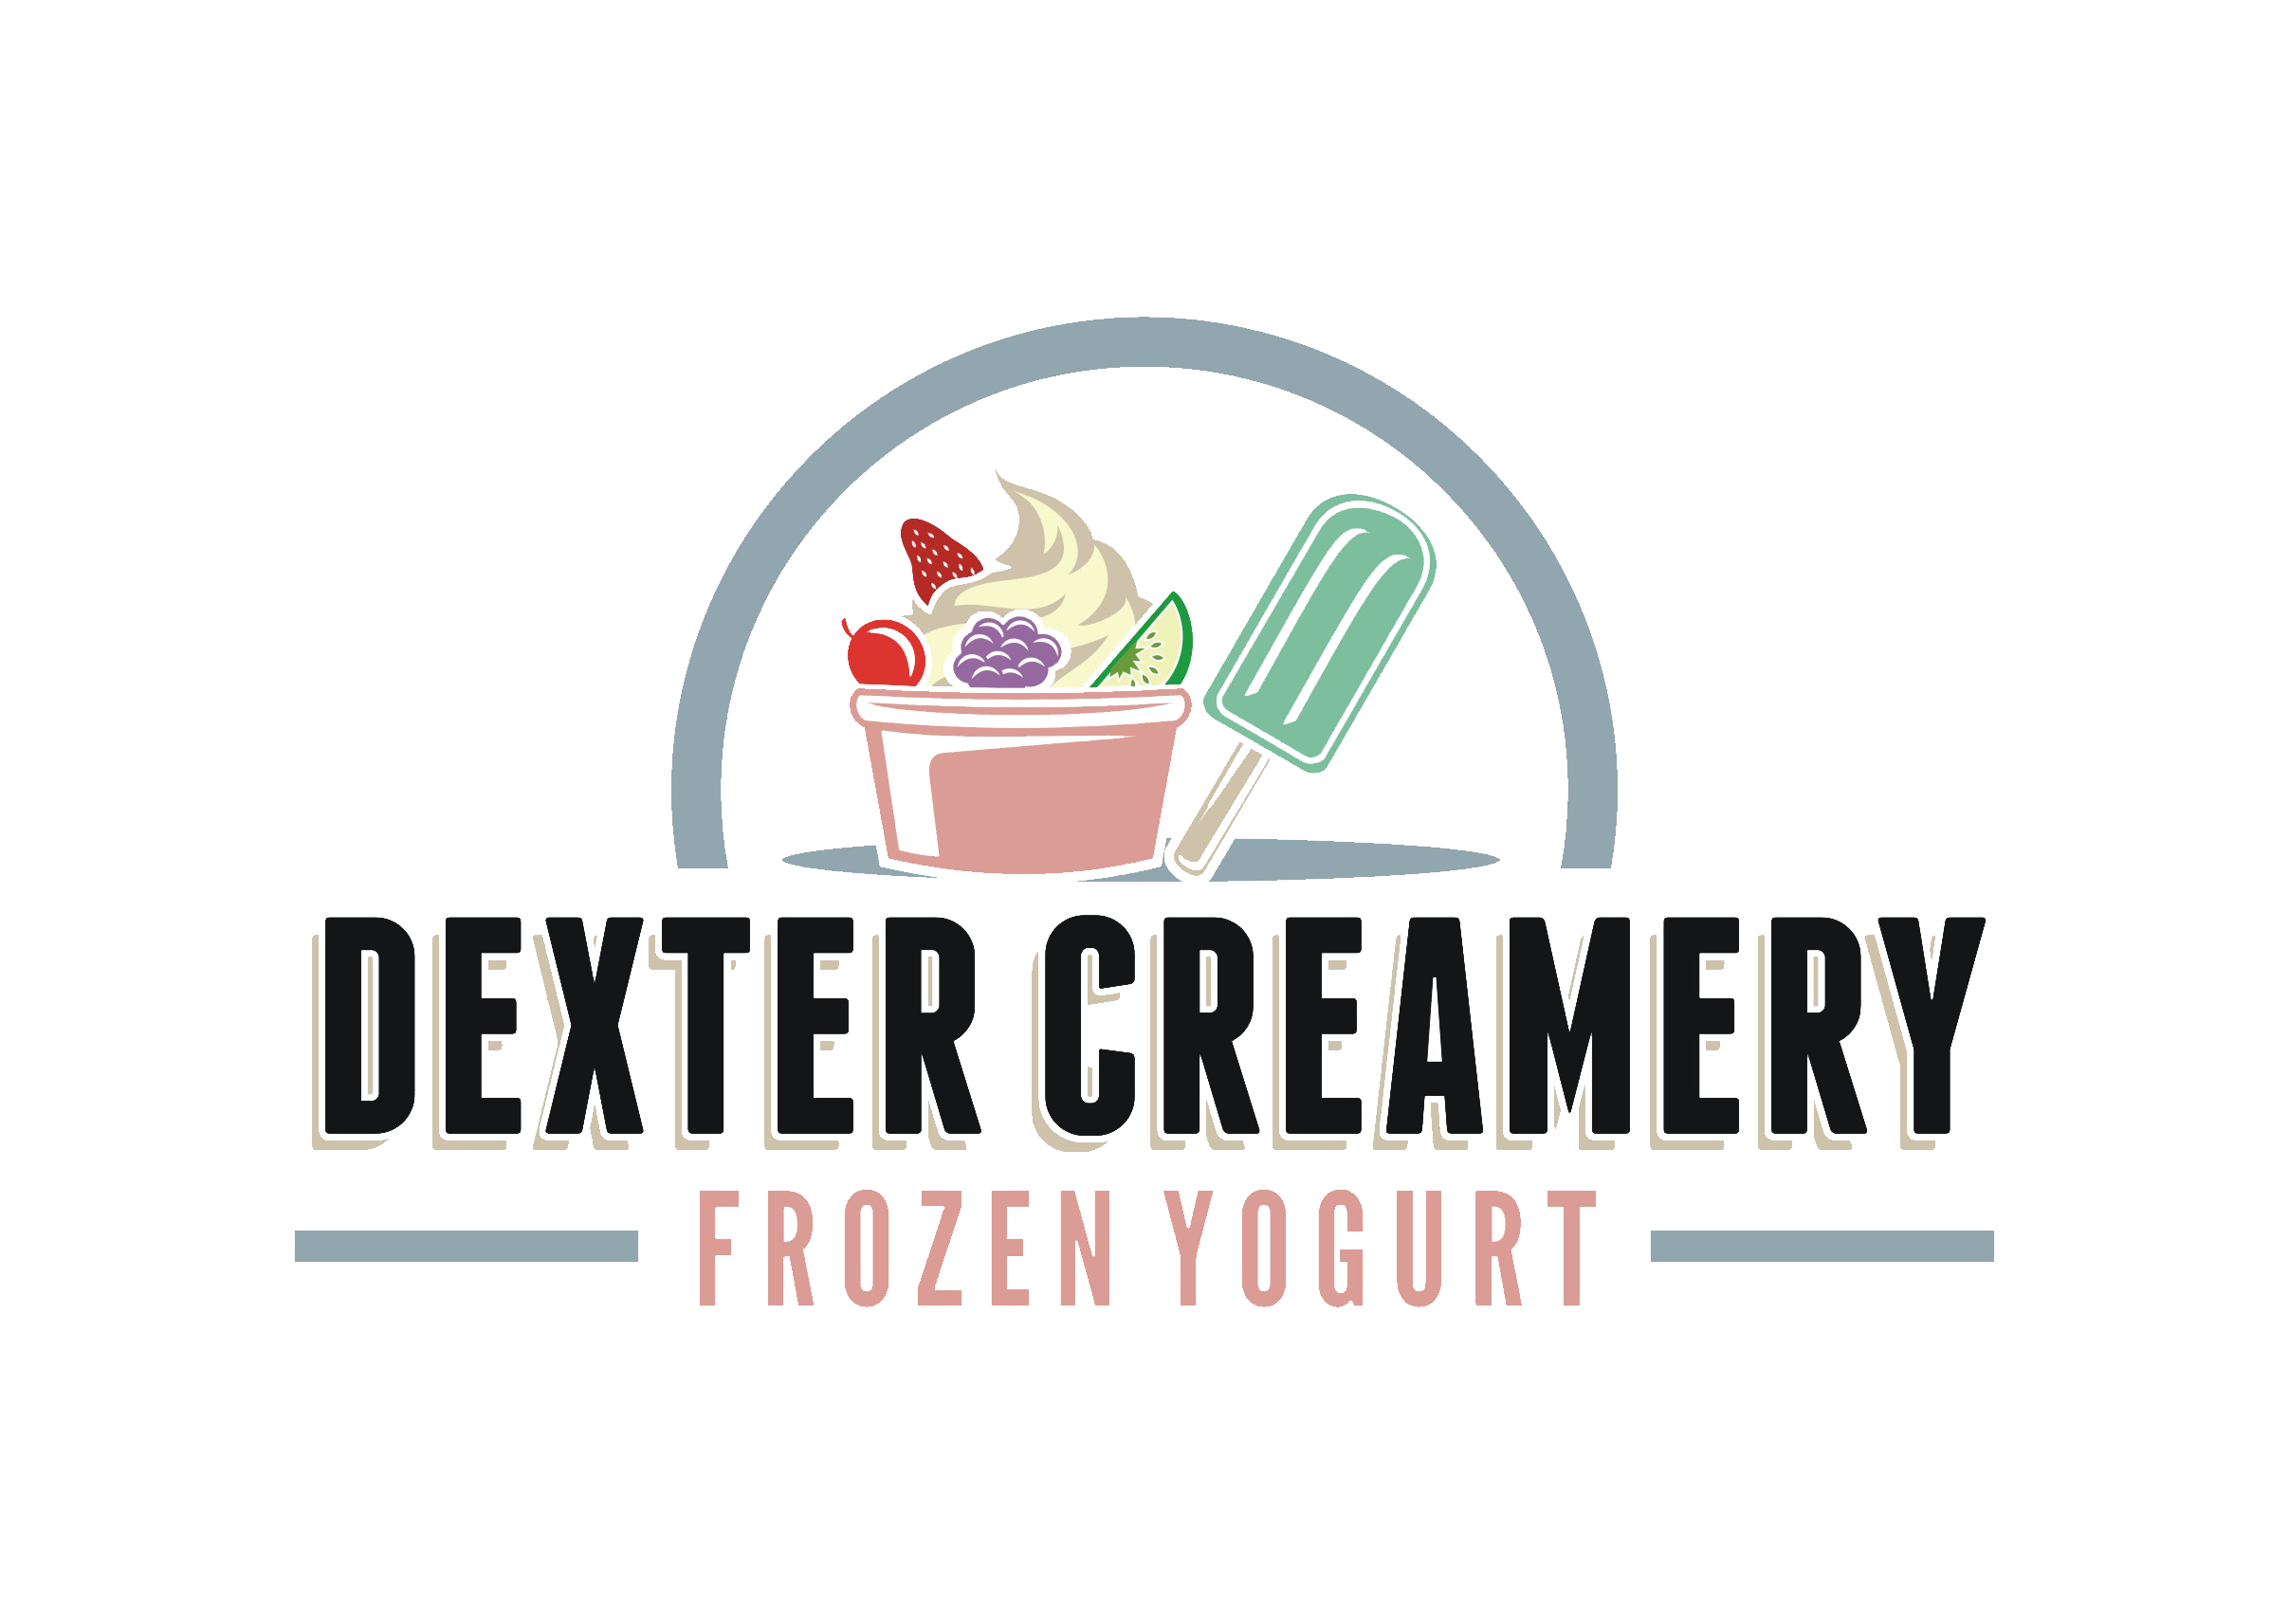 Dexter Creamery